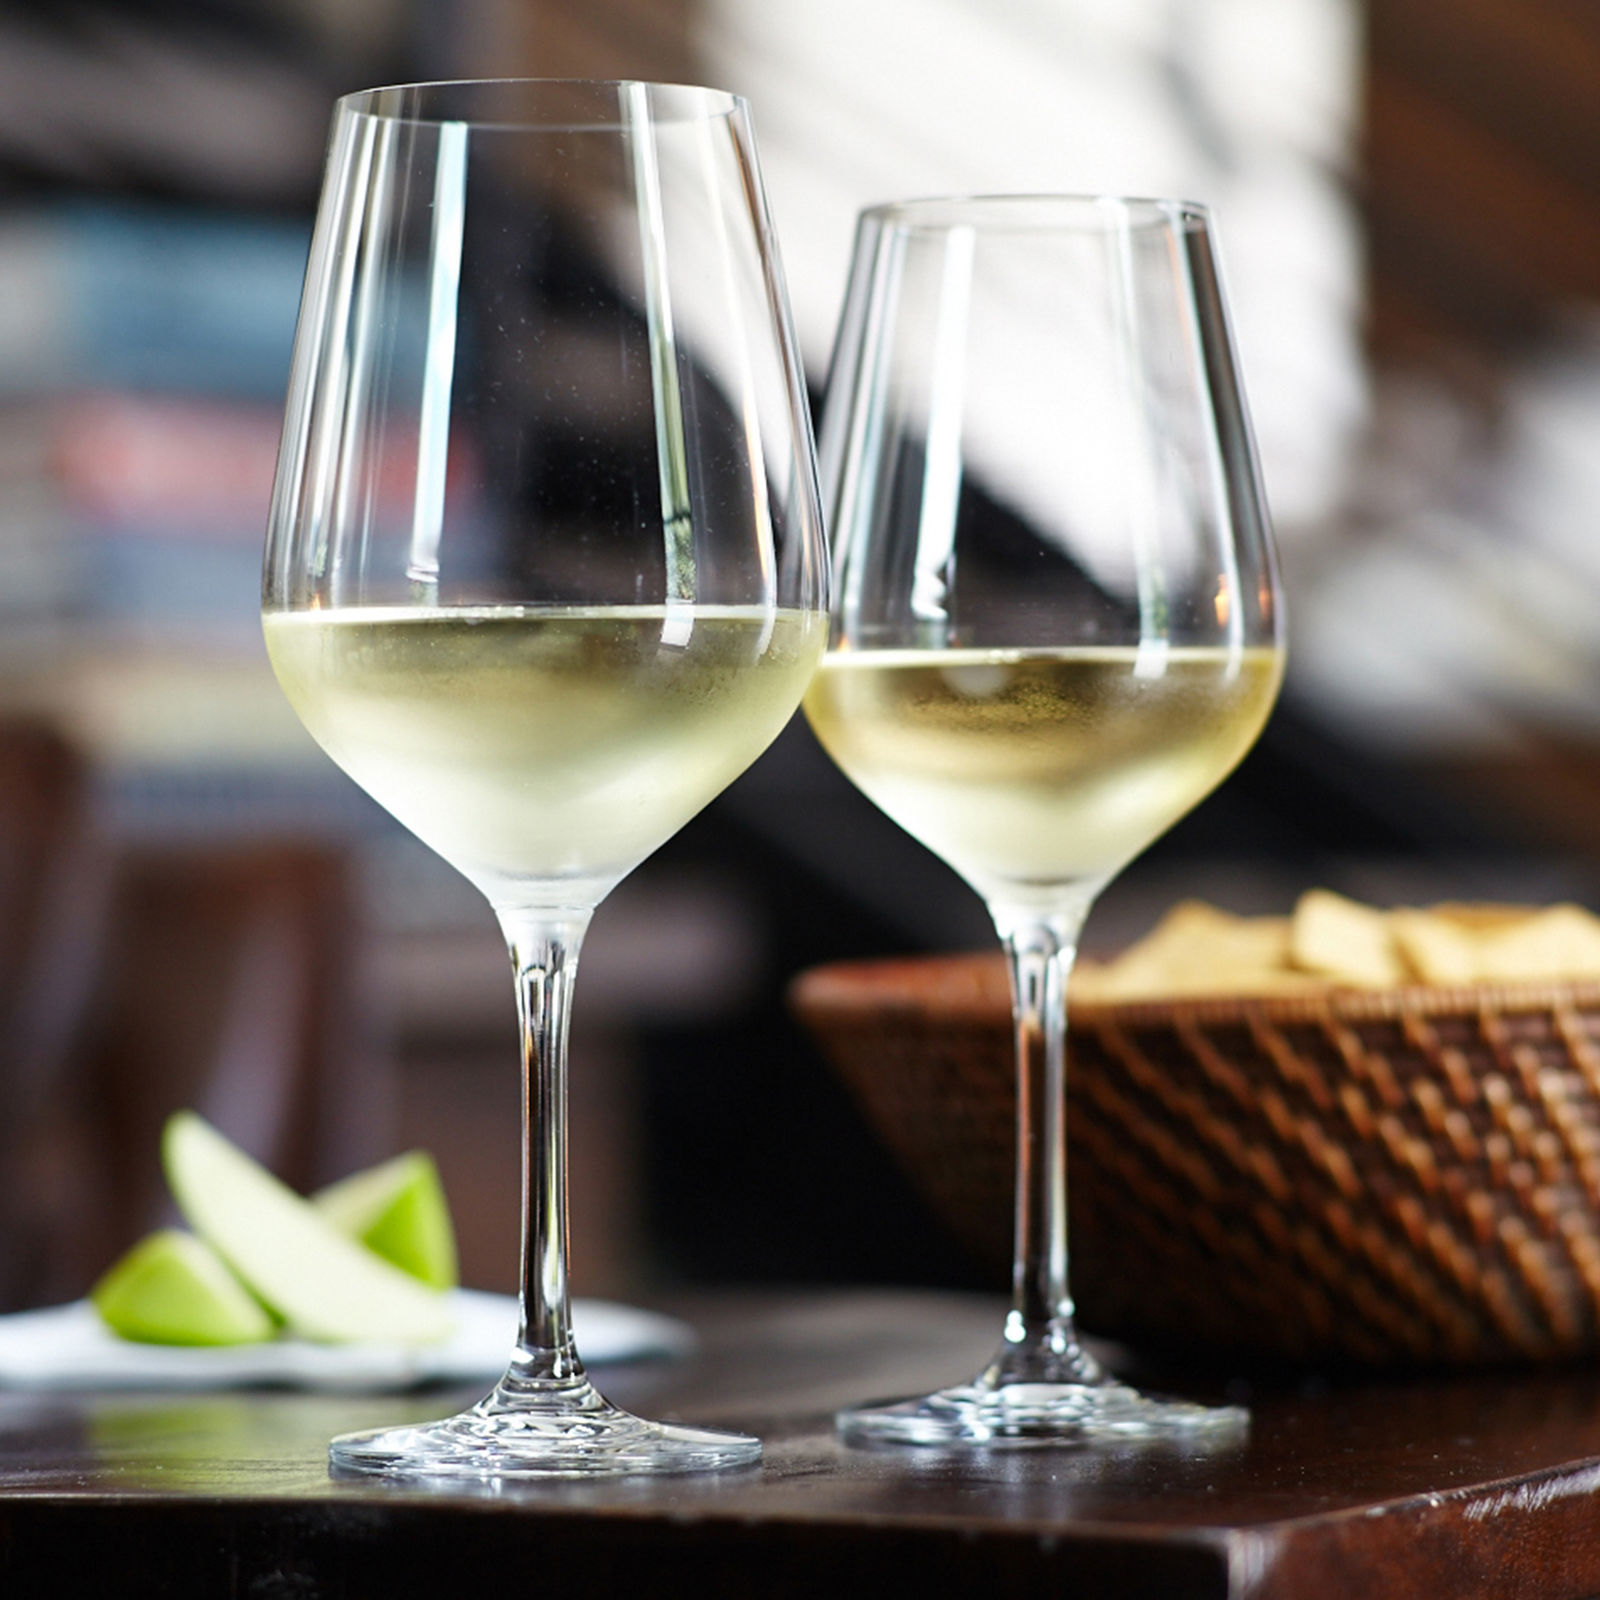 бокалы с белым вином фото